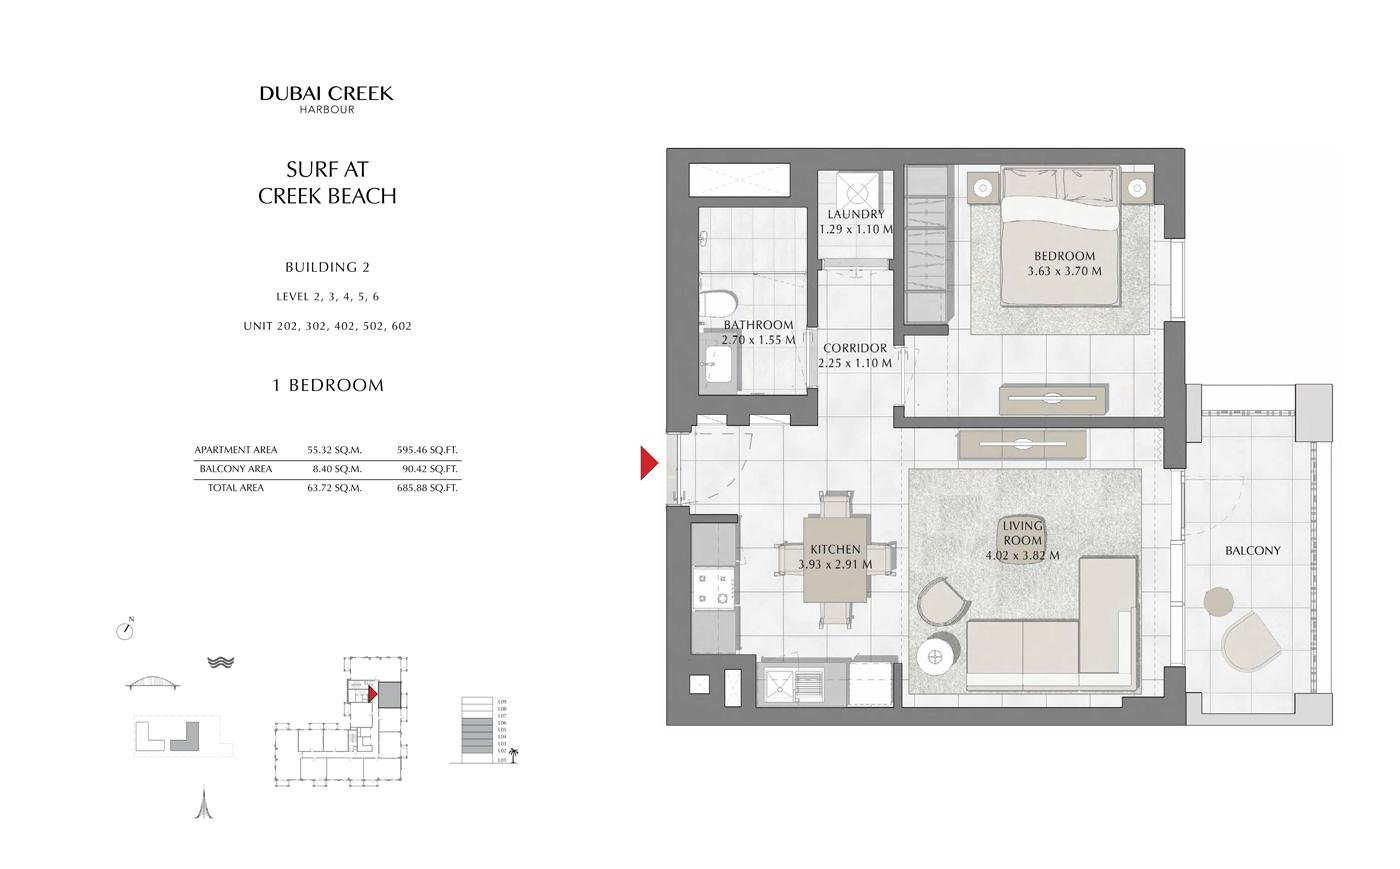 Building 2, 1 Bedroom Level 1, Size 685 Sq Ft